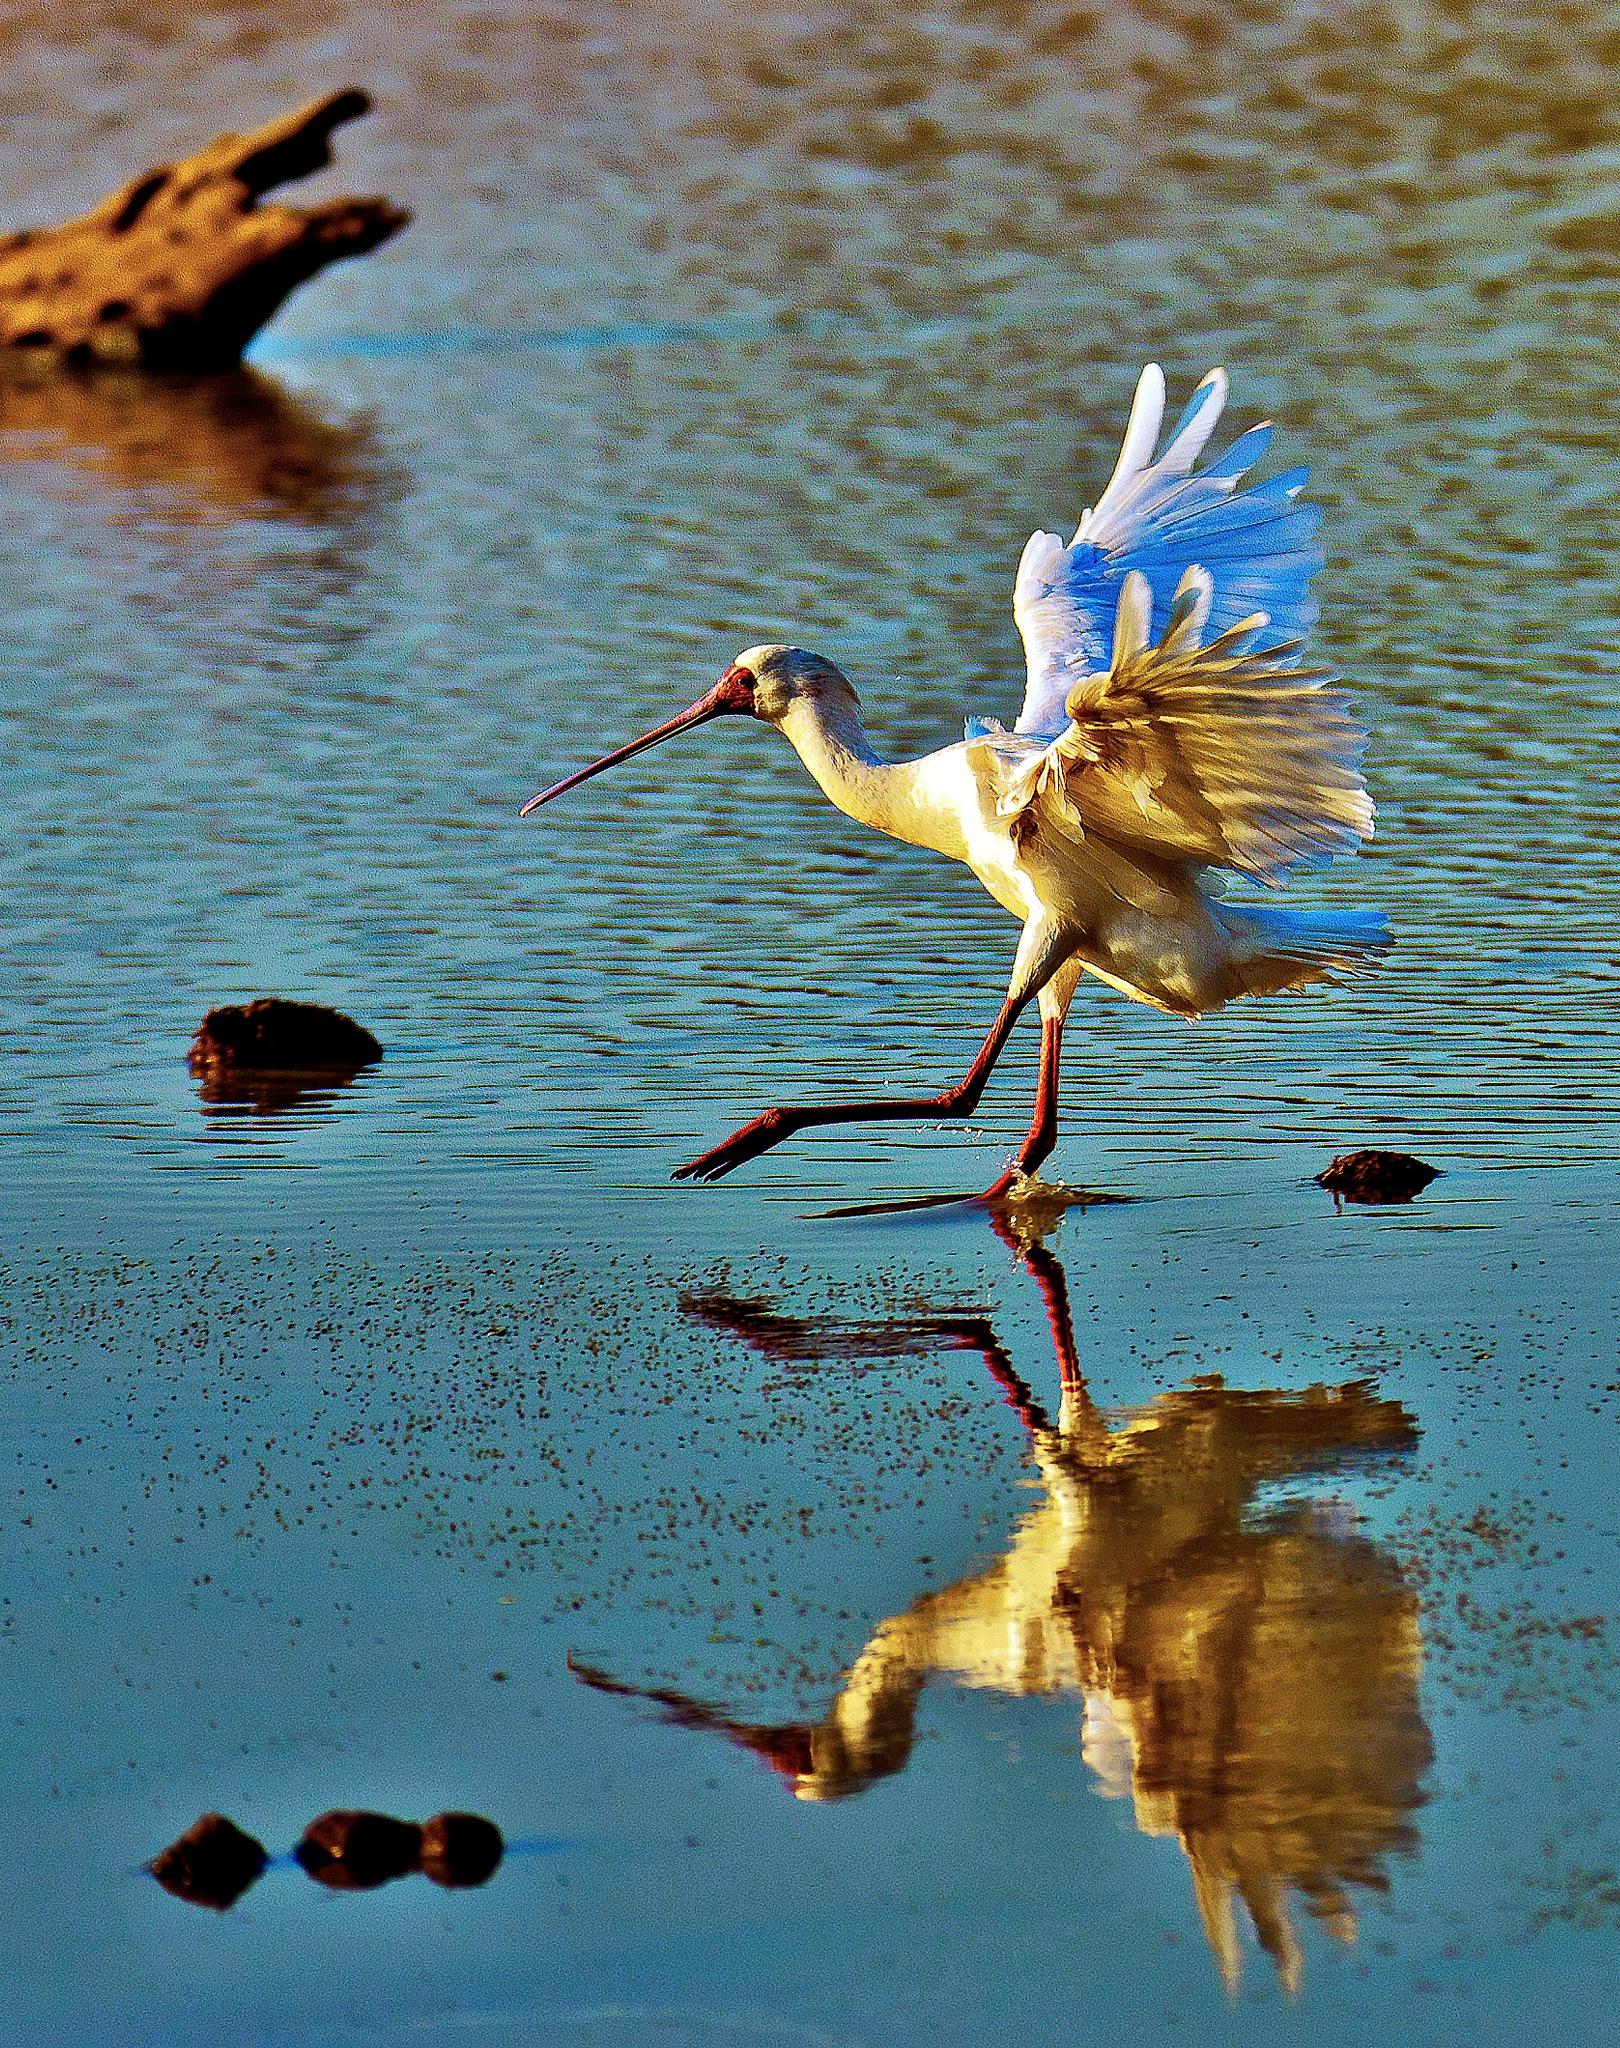 Water Walk by PeterMChambers